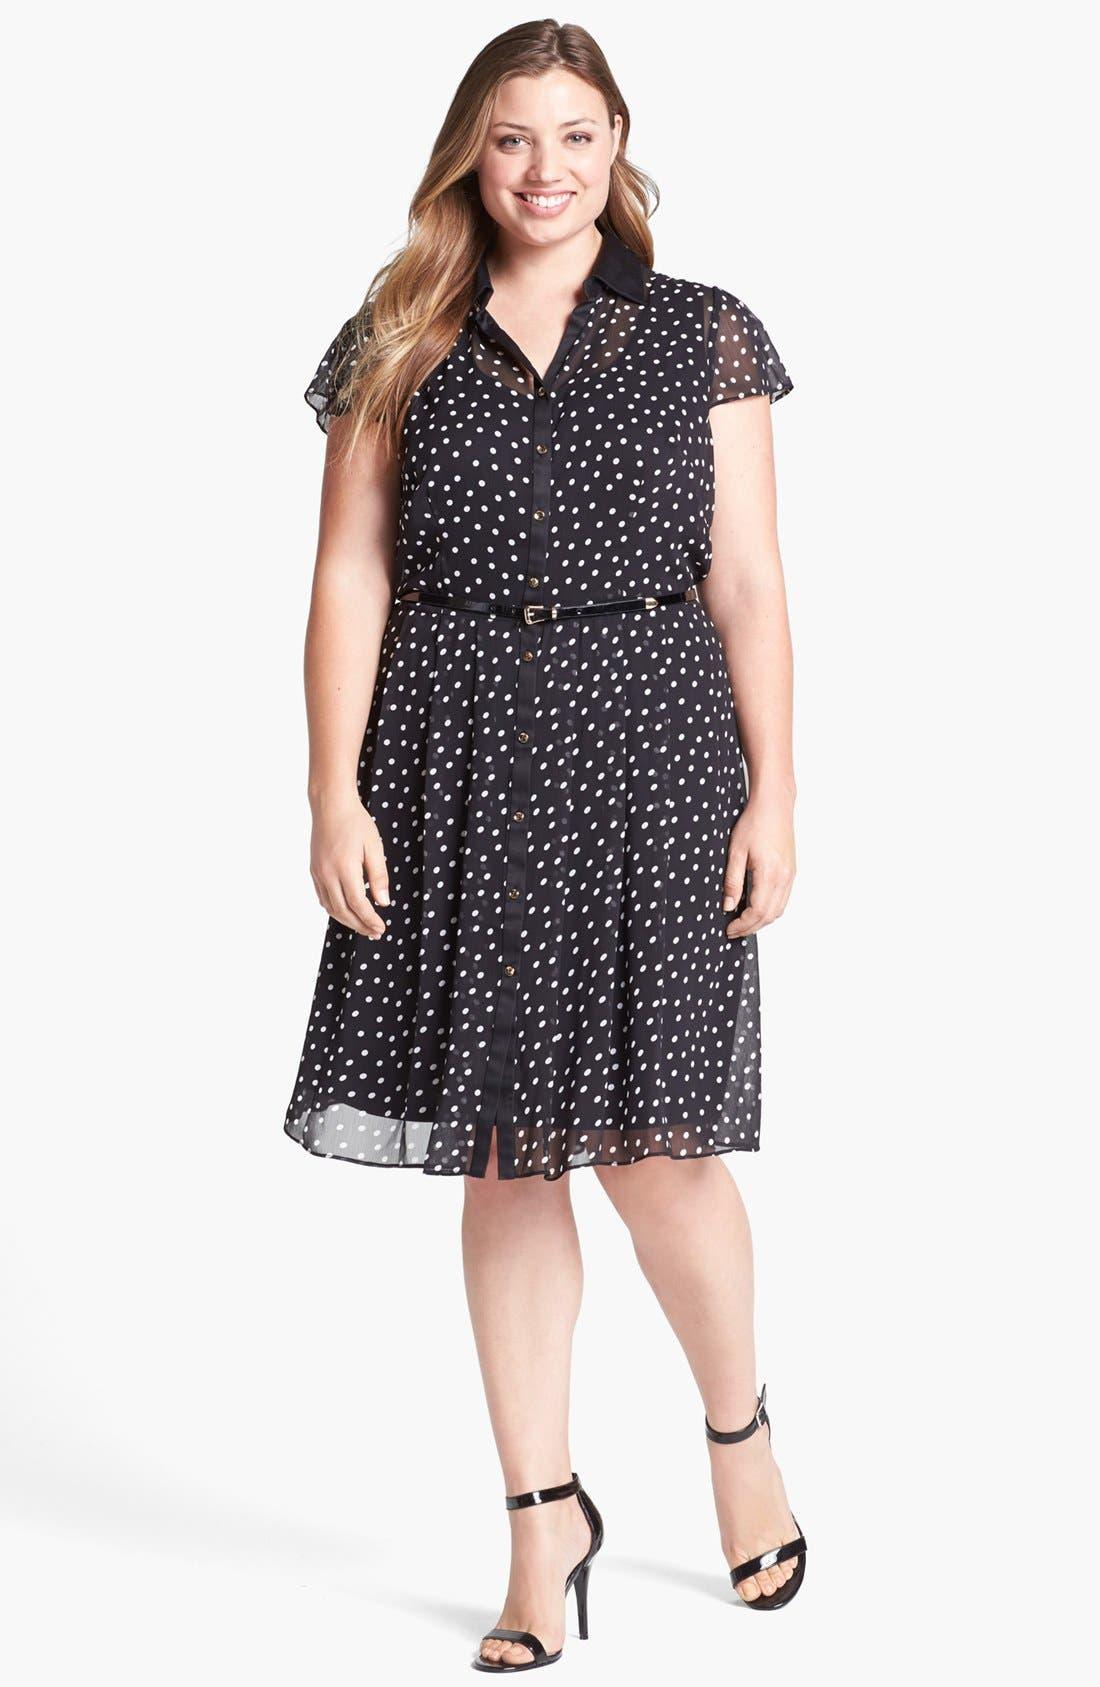 Alternate Image 1 Selected - Donna Ricco Polka Dot Chiffon Shirtdress (Plus Size)